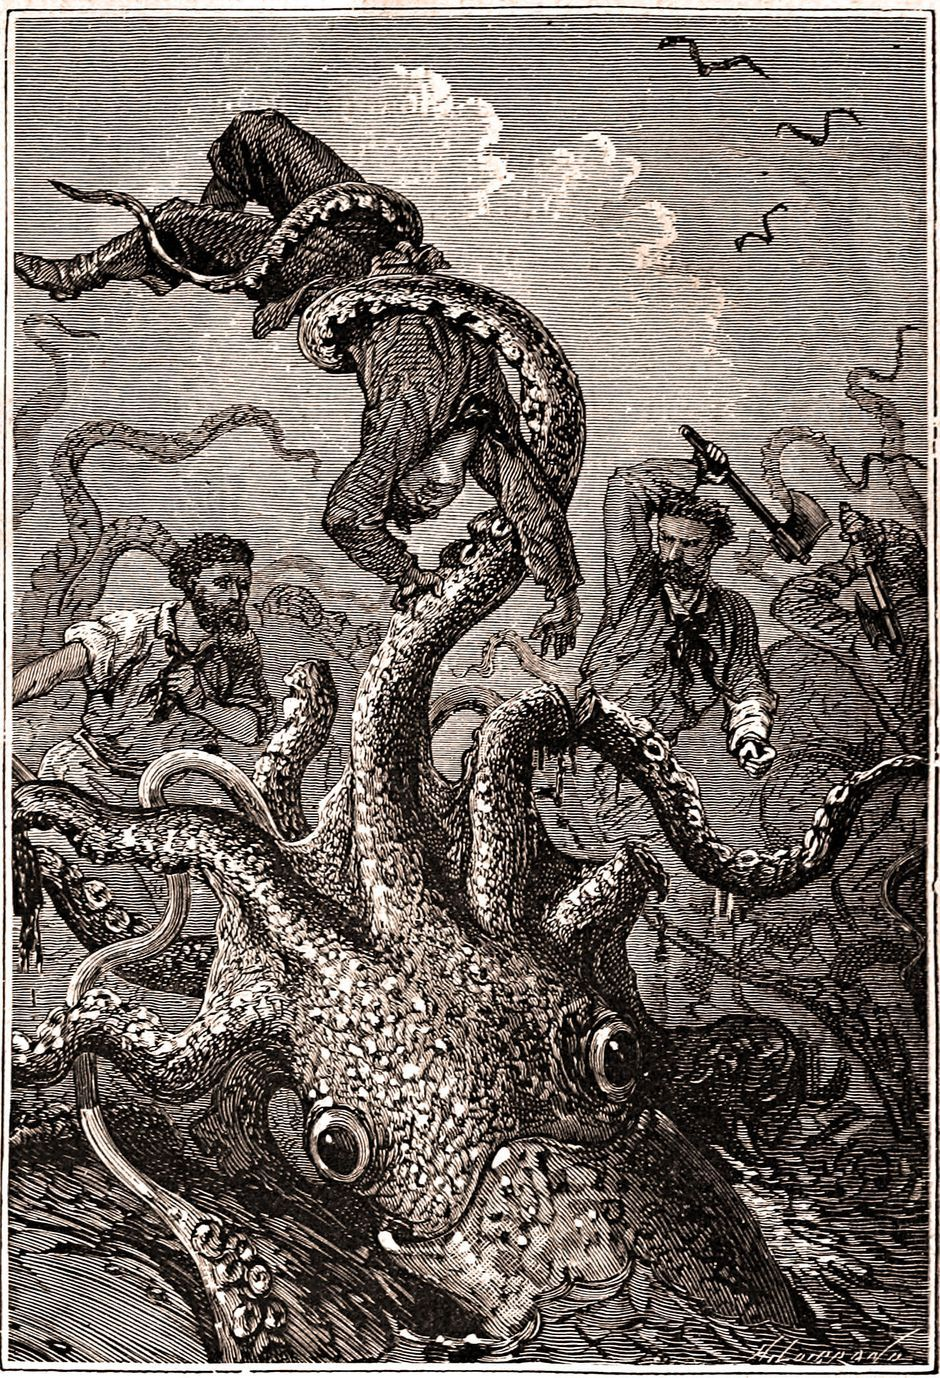 Legendary giant squid's genome revealed - CNET